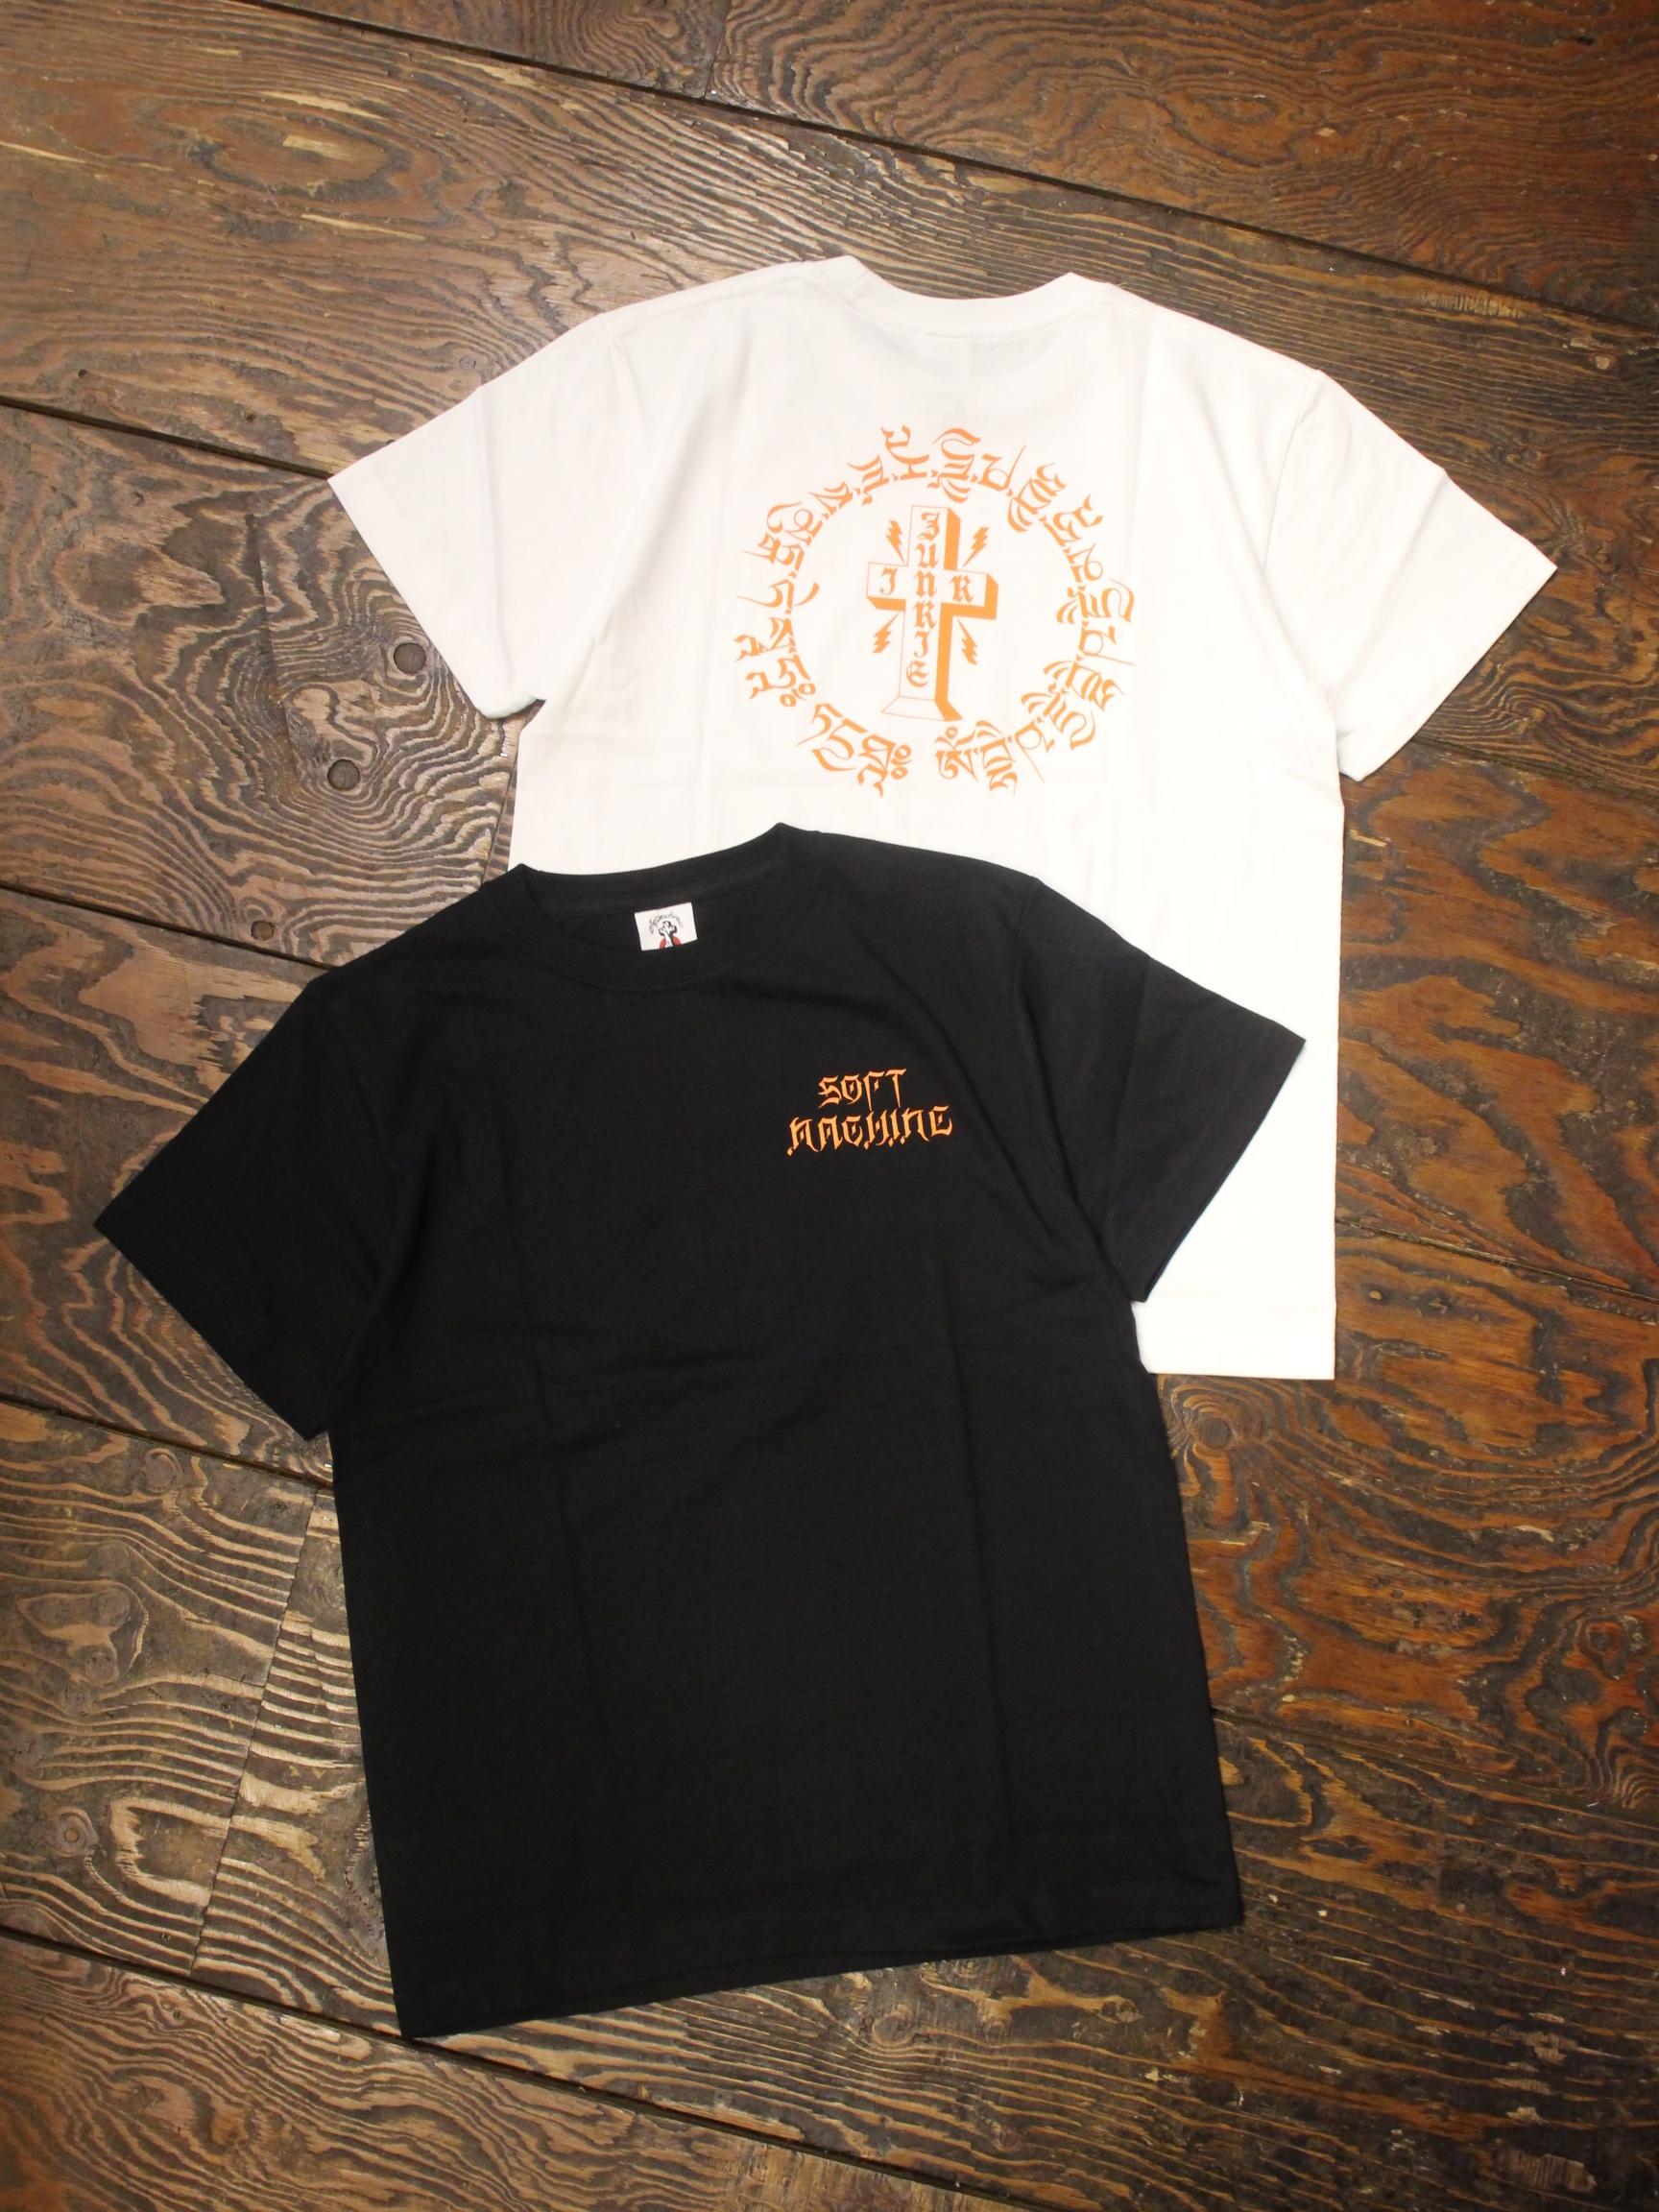 SOFTMACHINE  「OTHER WORLD - T」 プリントティーシャツ